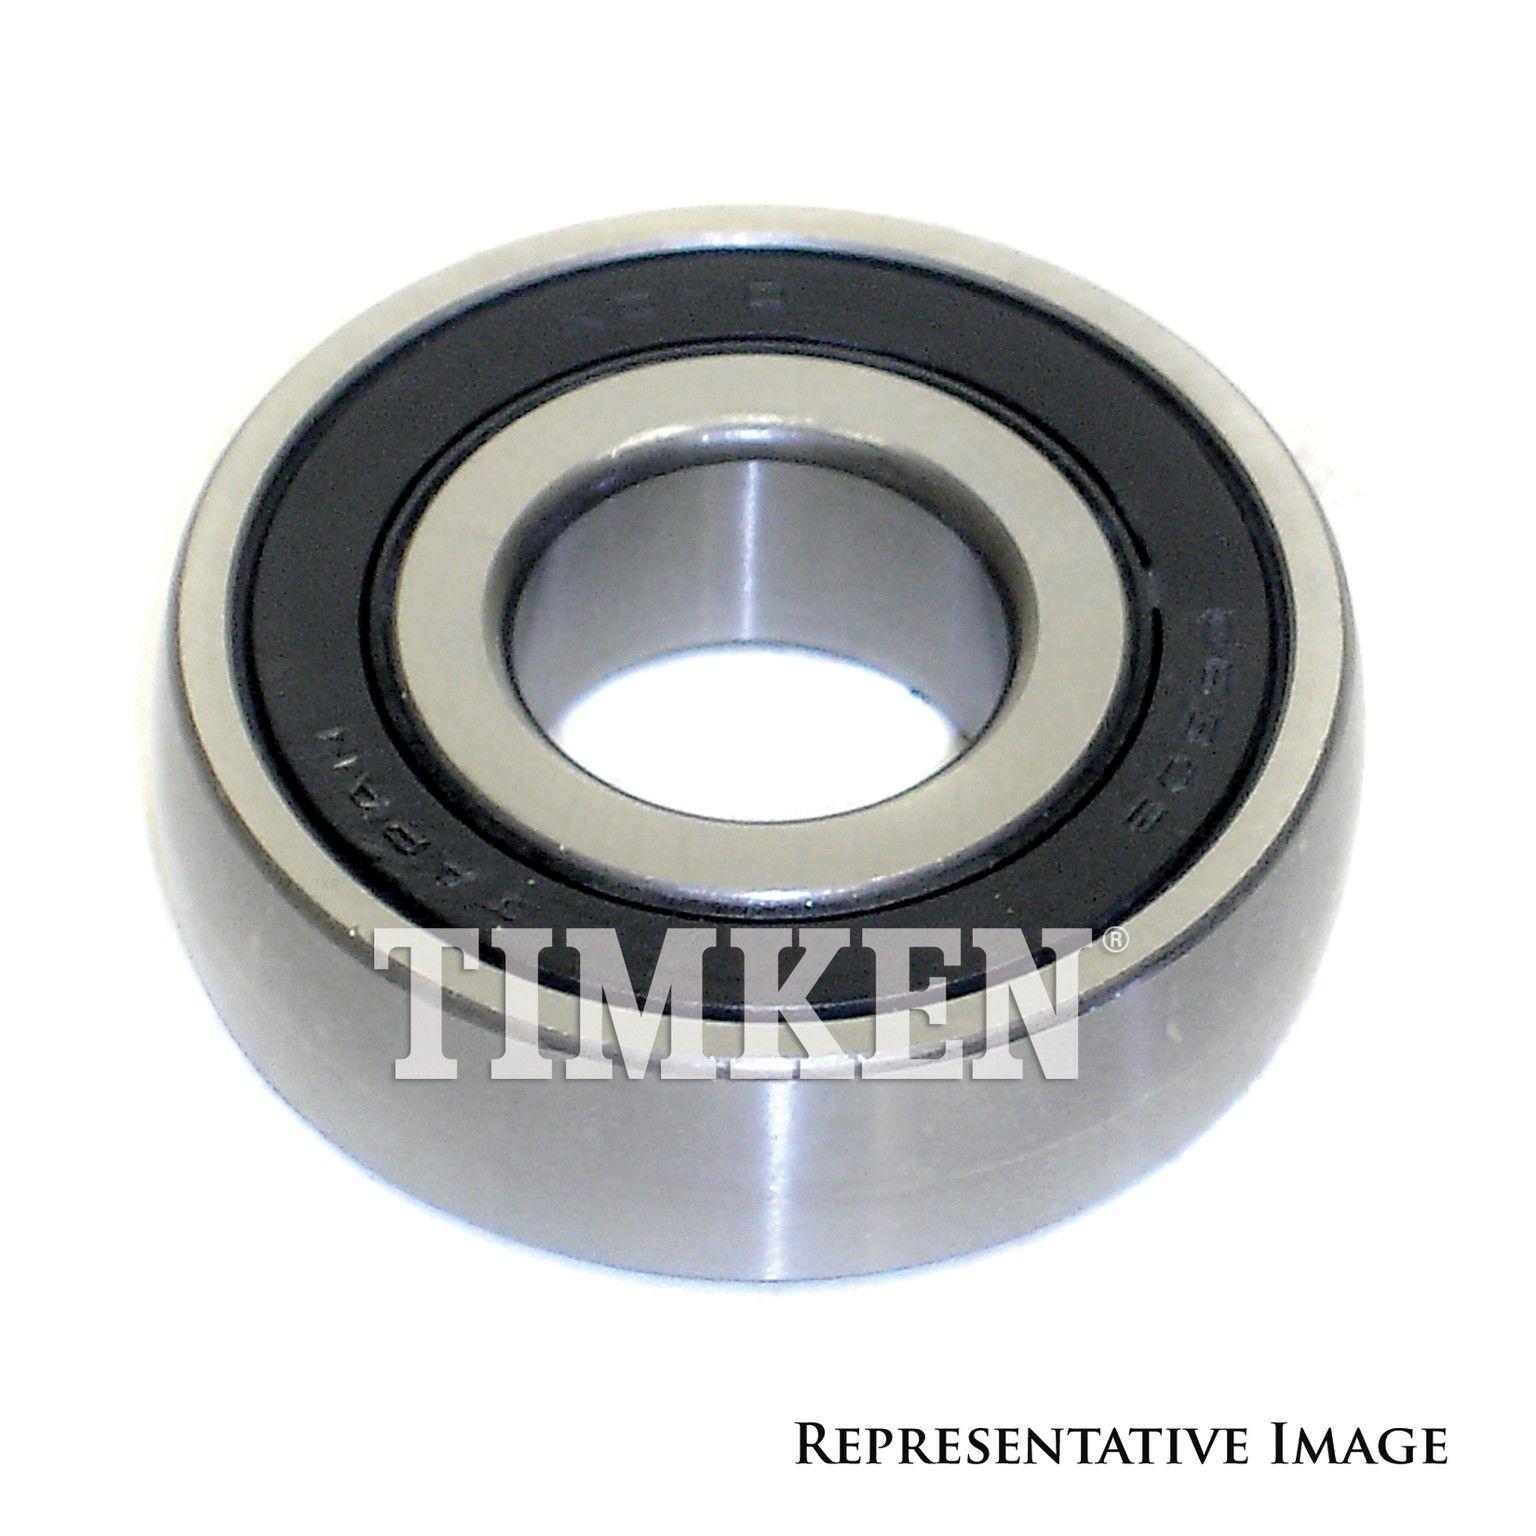 Toyota Land Cruiser Transfer Case Output Shaft Bearing Replacement 1979 Front Timken 308l